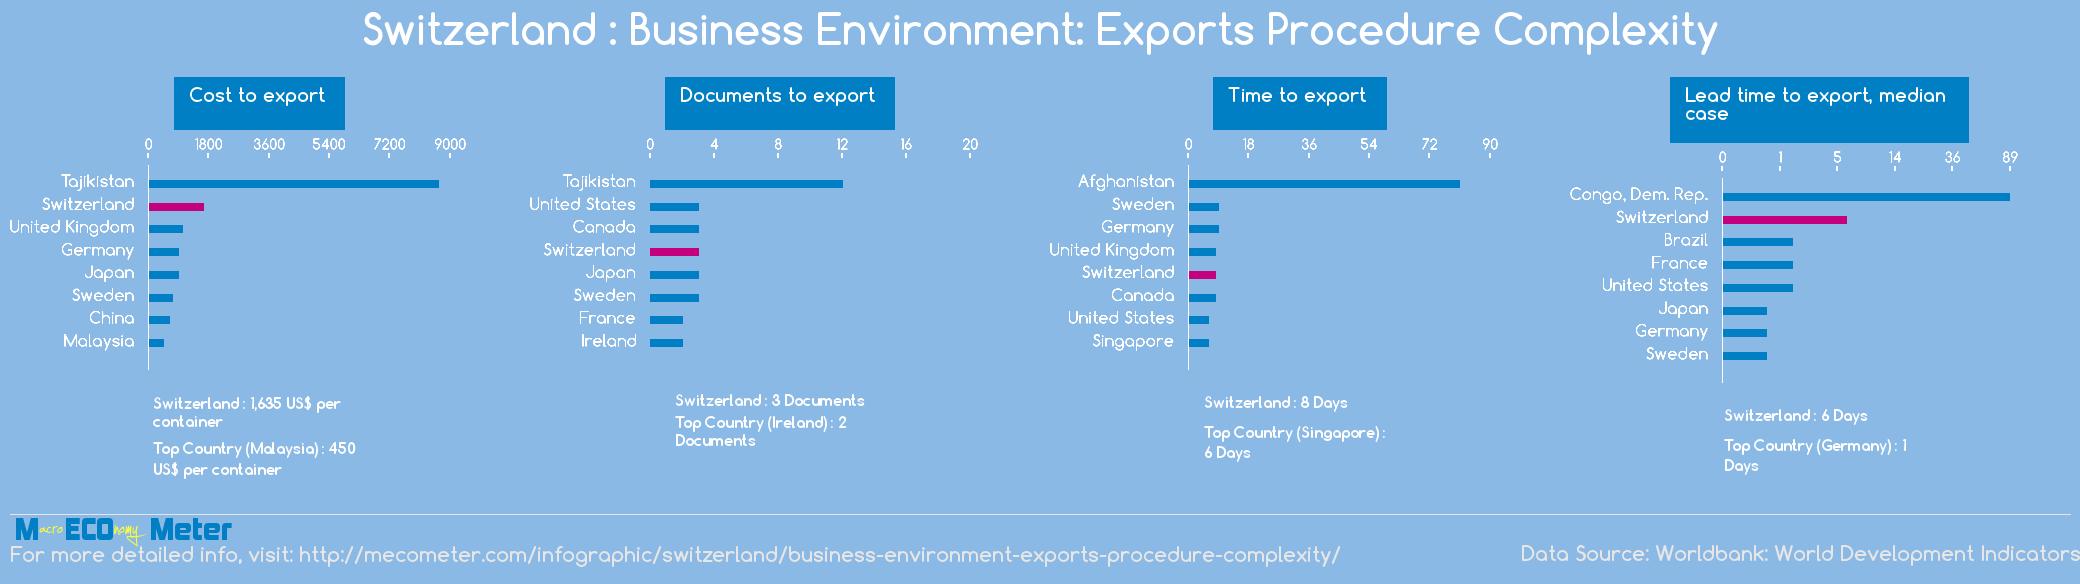 Switzerland : Business Environment: Exports Procedure Complexity